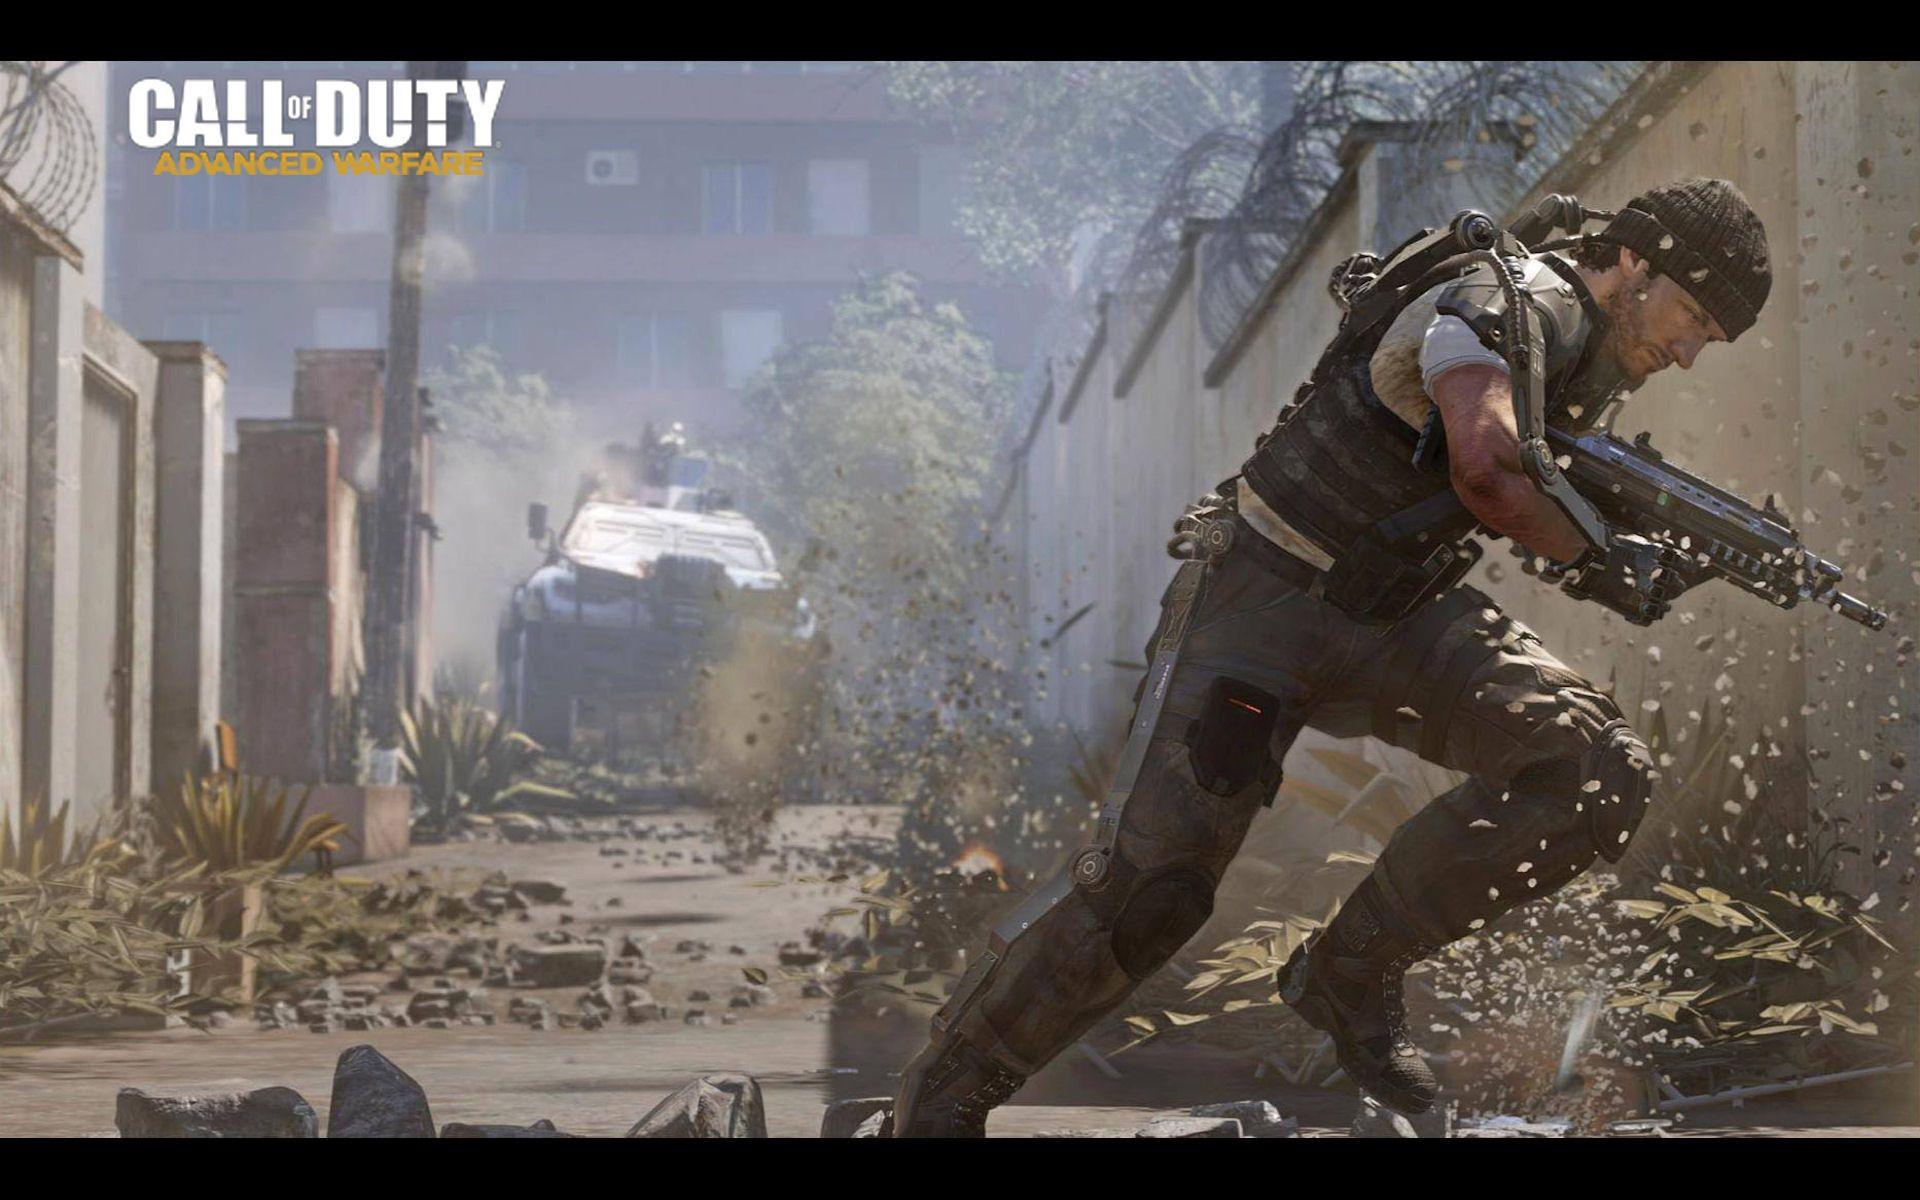 Pin By Jeri Ryan On Call Of Duty Advanced Warfare Zombies Call Of Duty Aw Call Of Duty